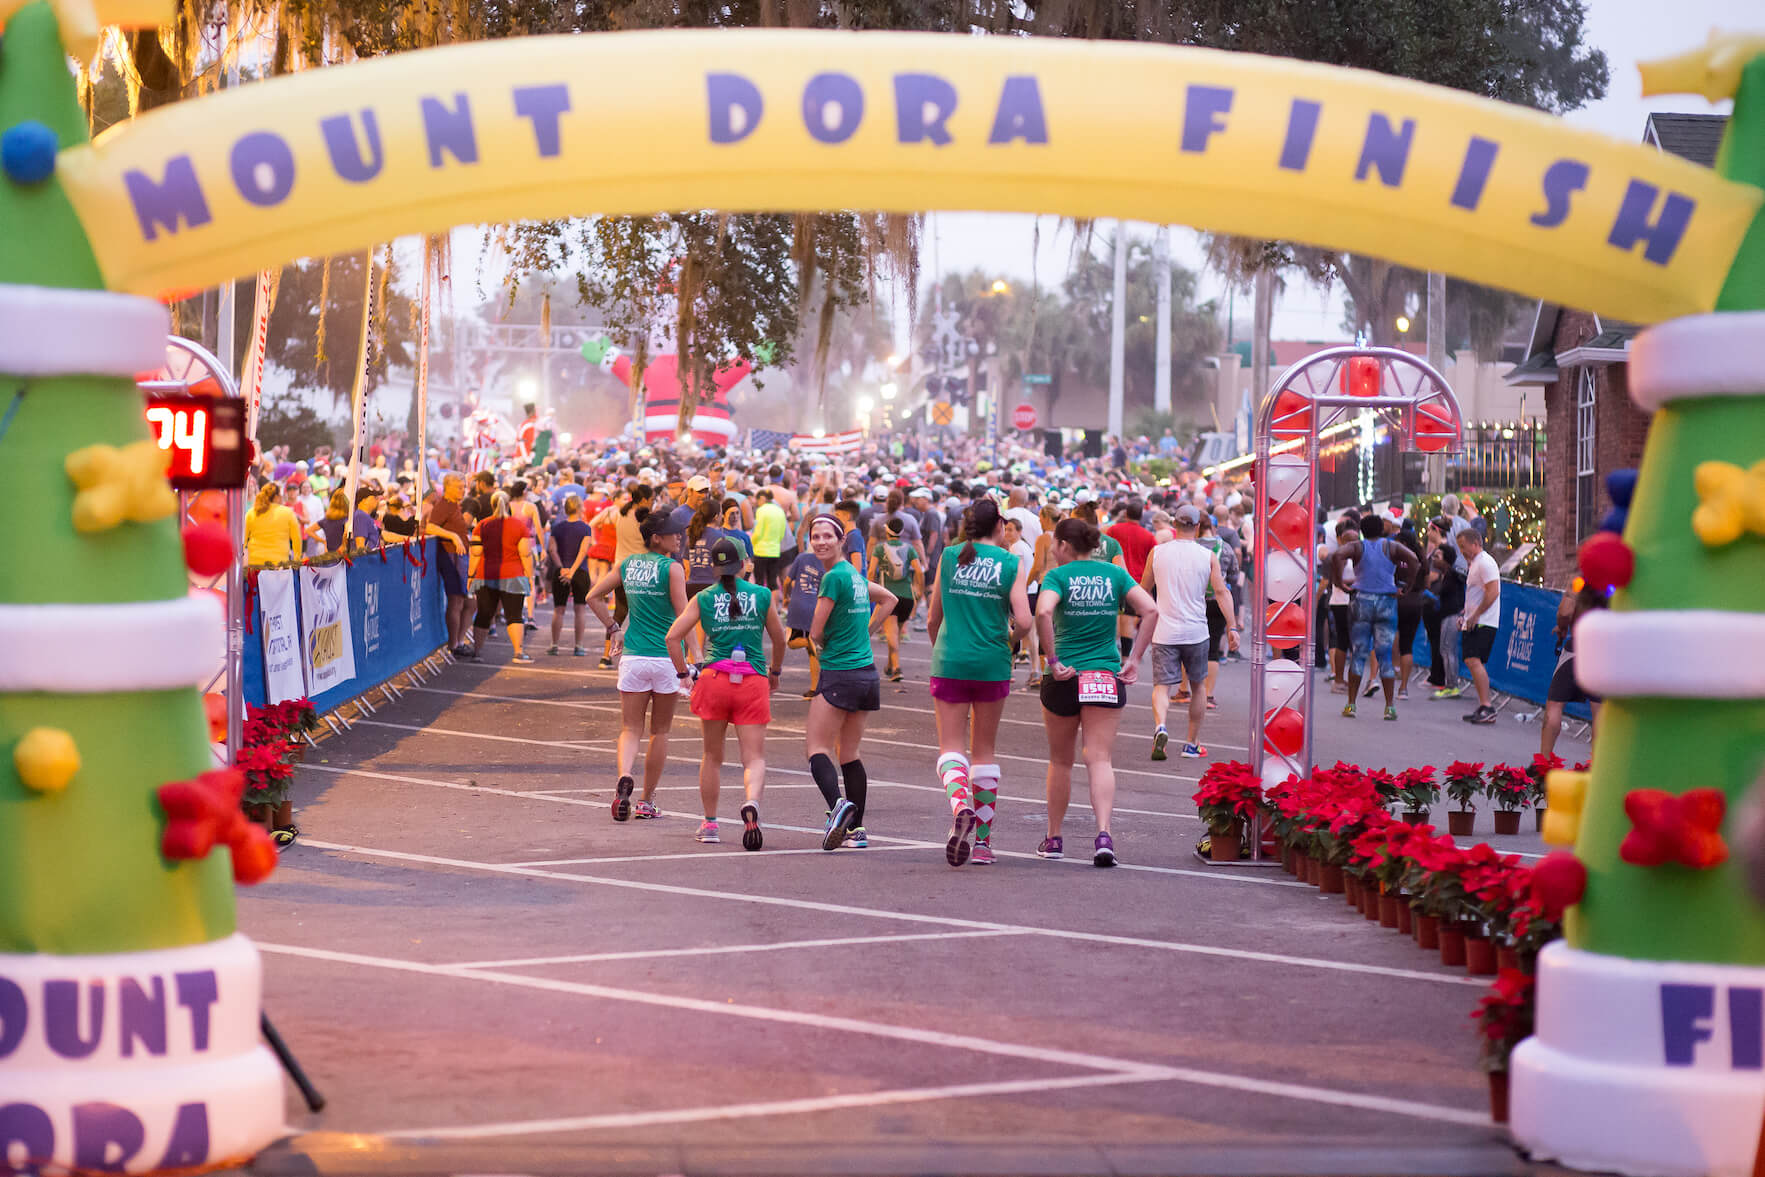 Mount Dora 5k finish line